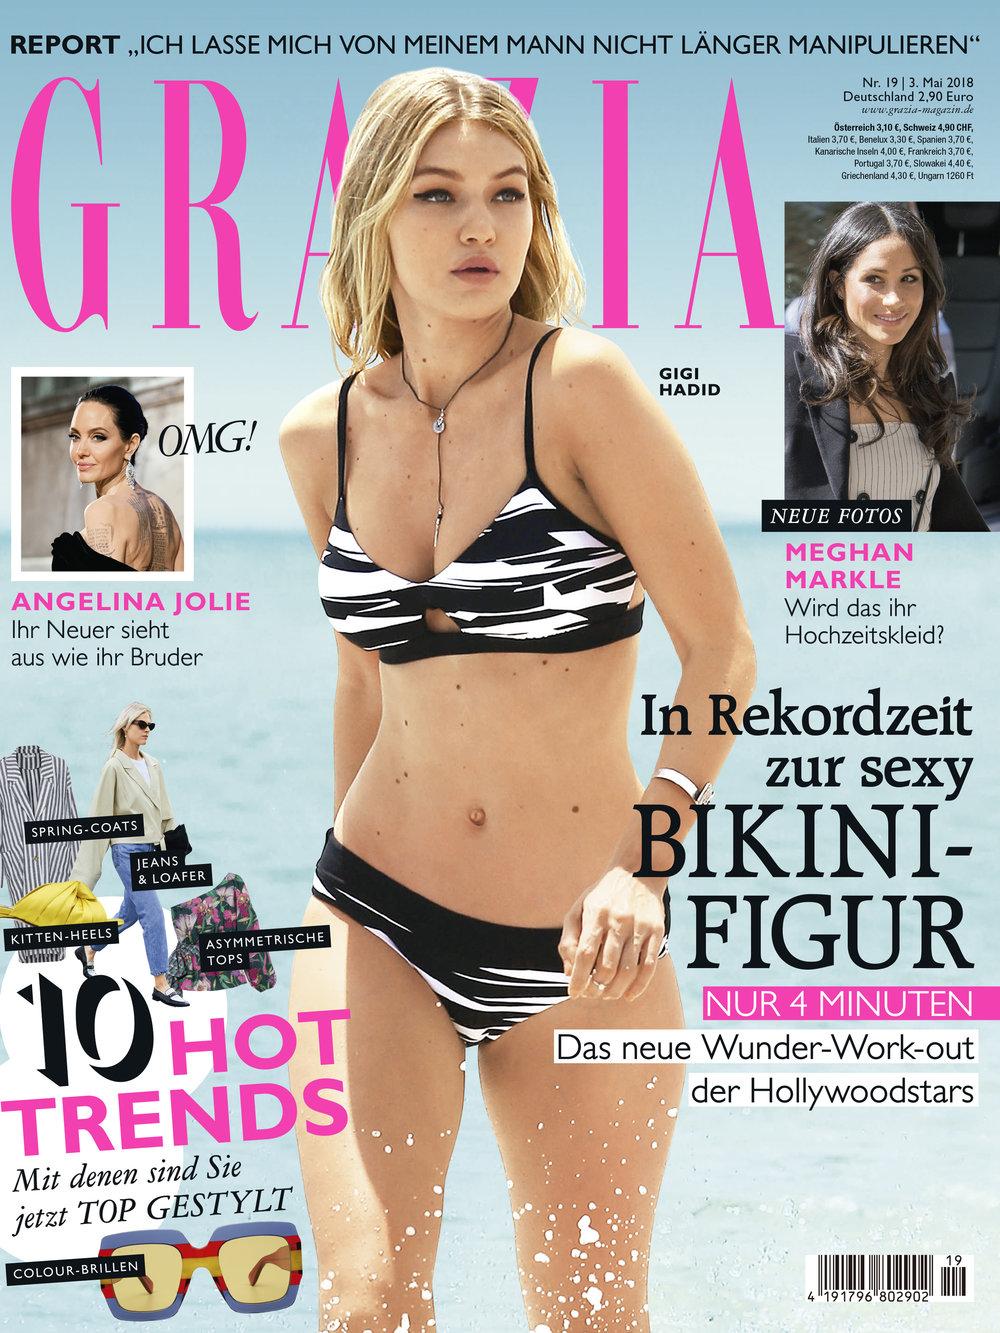 Grazia Germay May 2018 - Berta Cabestany (Cover).jpg